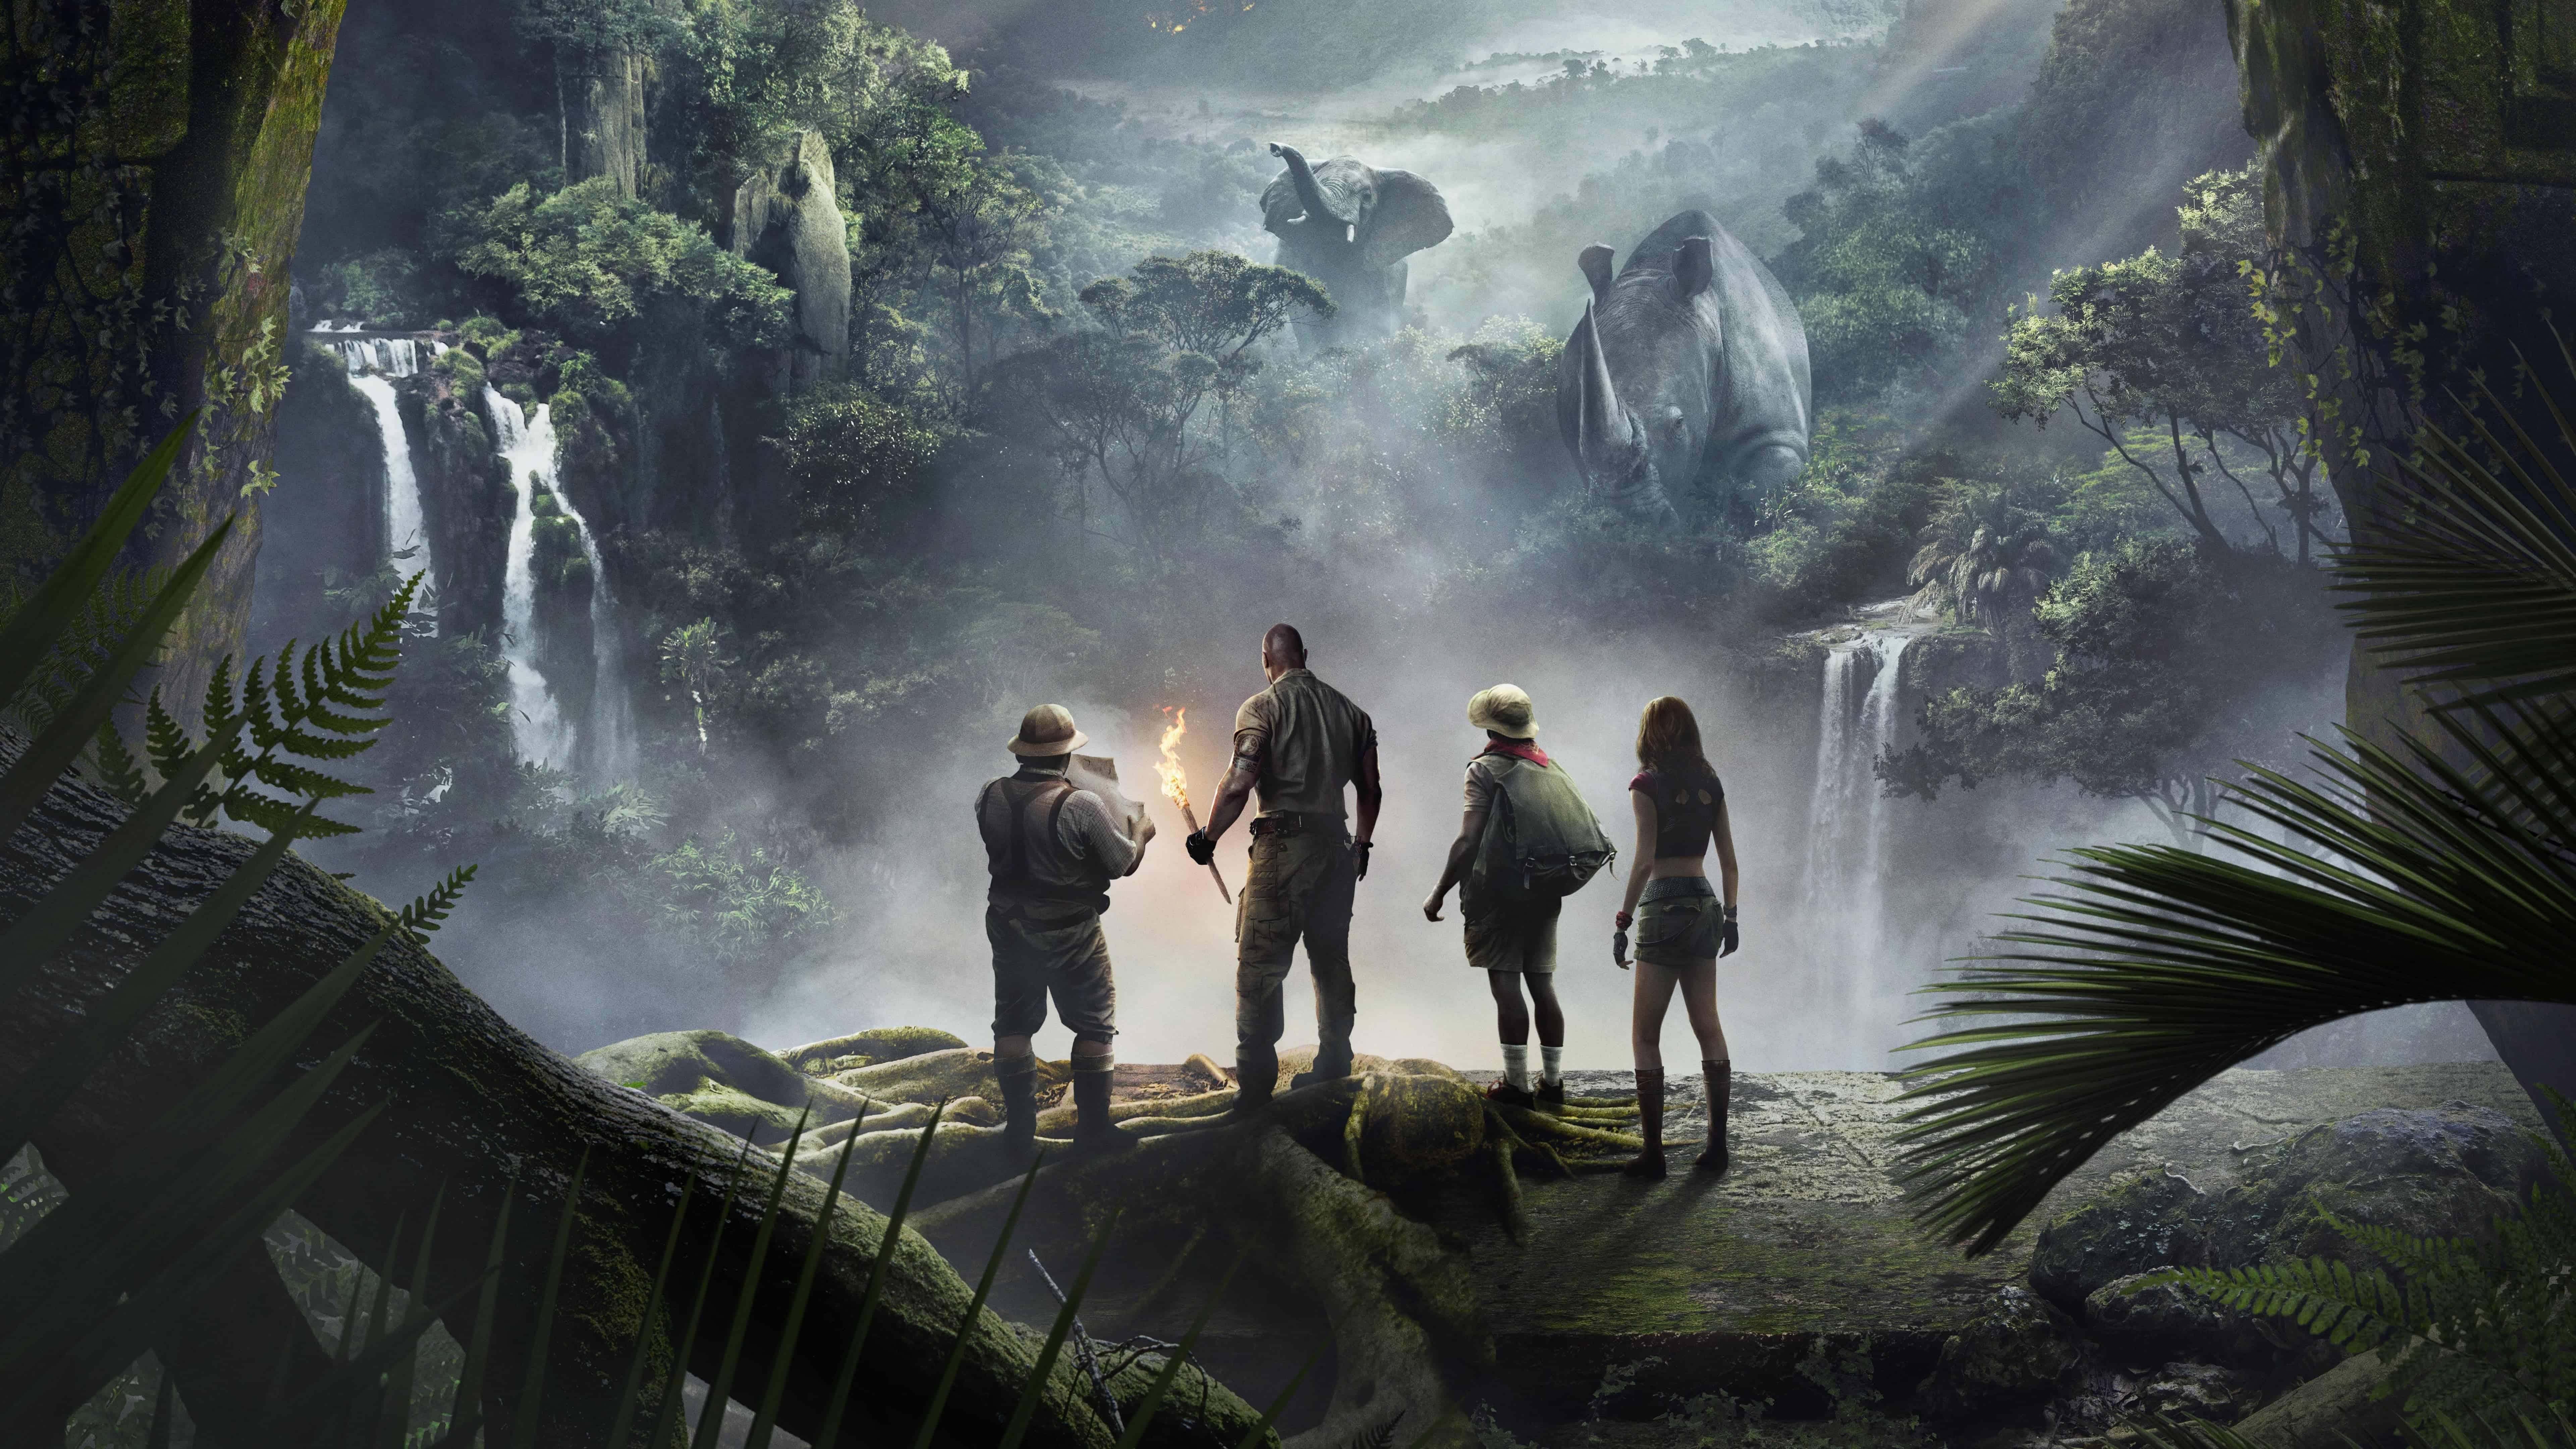 Jumanji Welcome To The Jungle UHD 8K Wallpaper | Pixelz